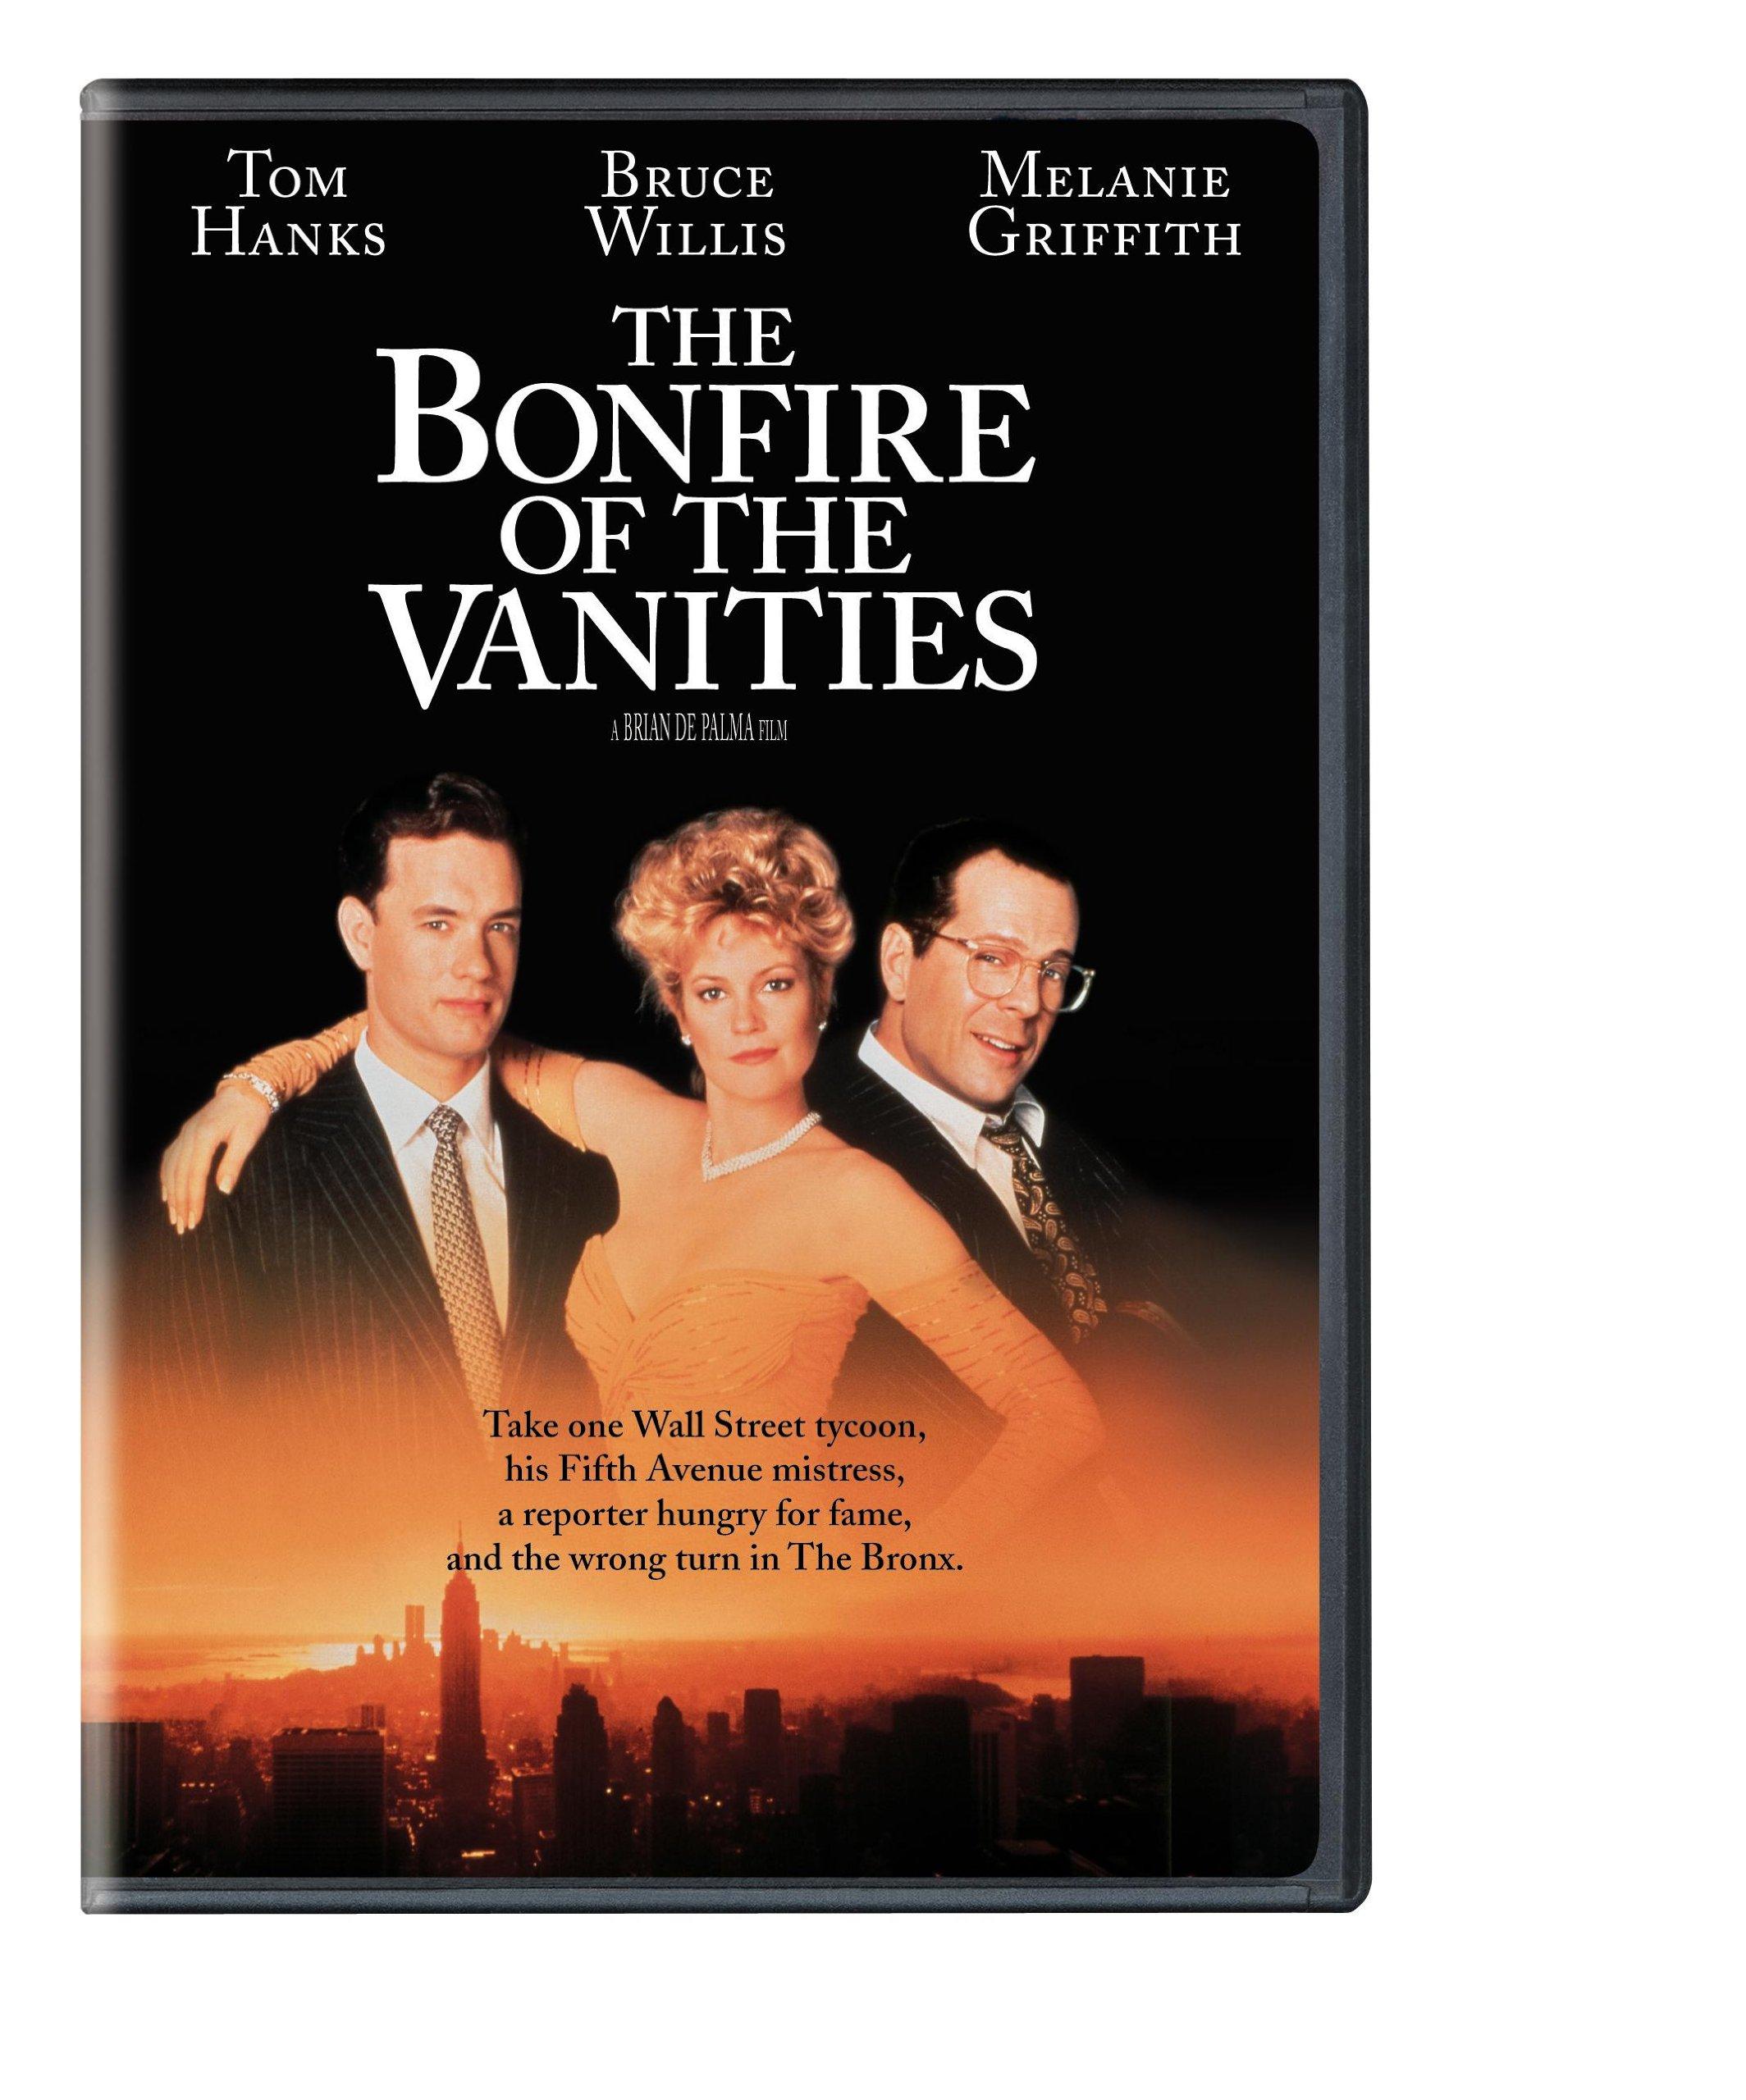 DVD : The Bonfire of the Vanities (Amaray Case, Widescreen, Repackaged)